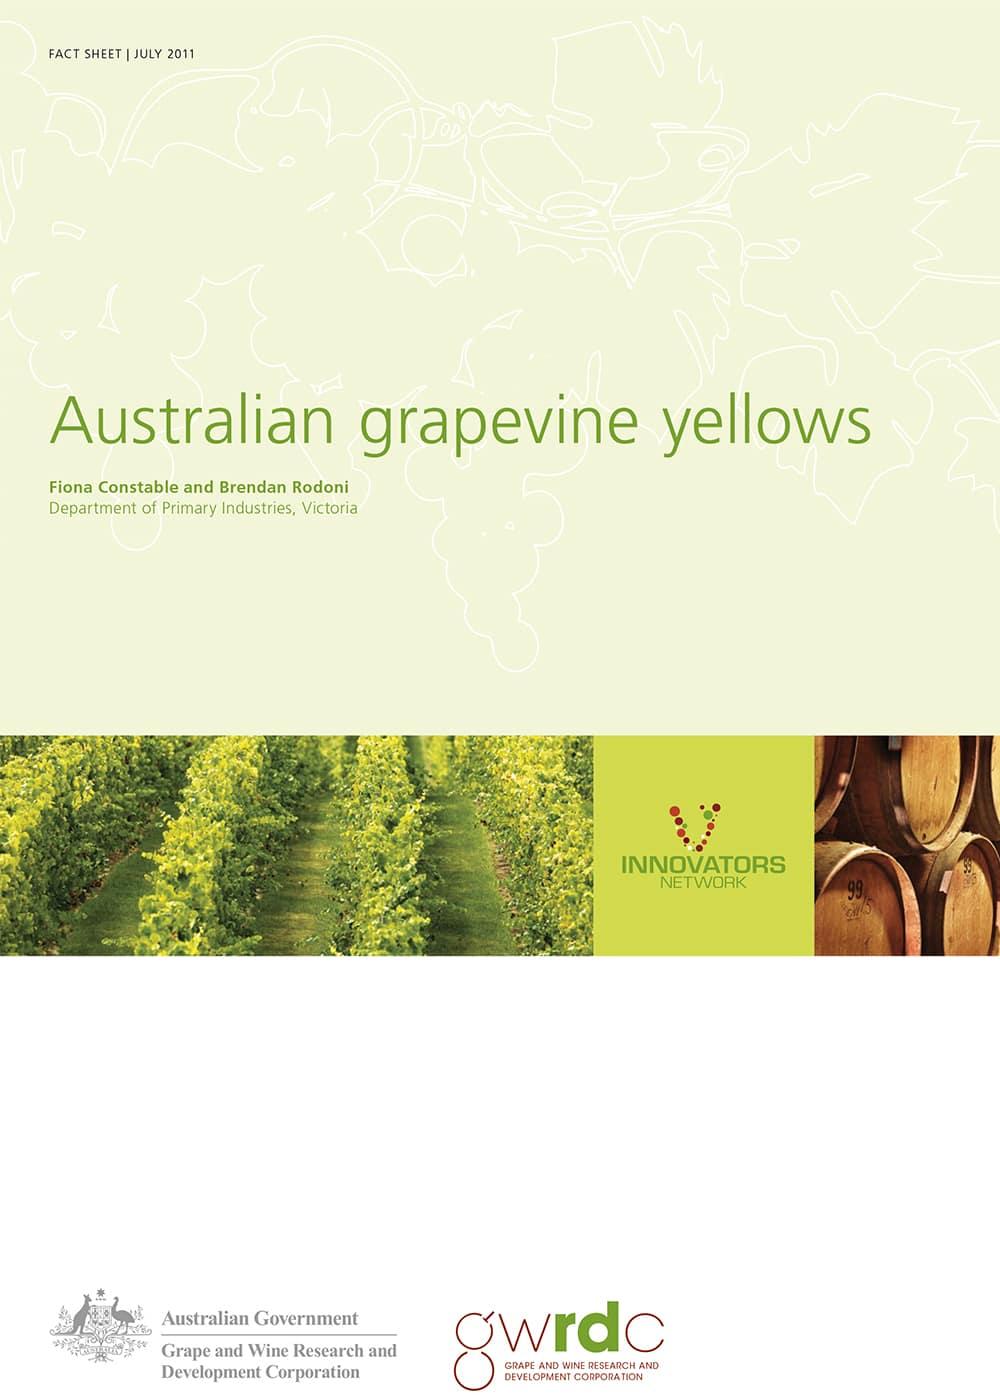 Australian Grapevine Yellows